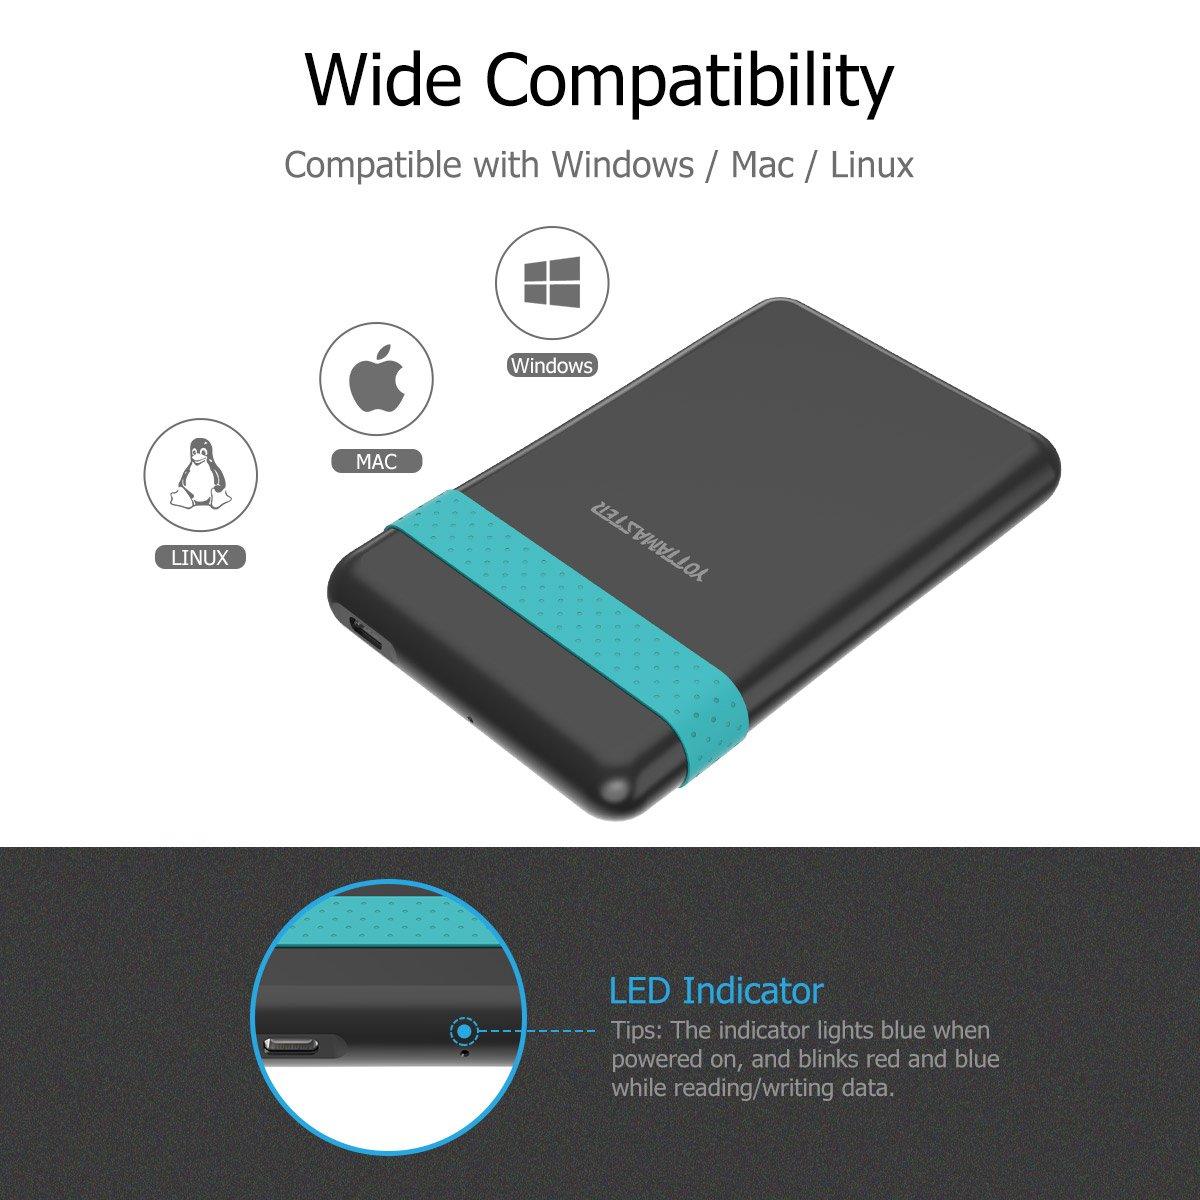 Supporto 2TB e UASP A5-U3 Yottamaster Tool gratuito USB3.0 Micro B a SATA III da 2,5 Enclosure per disco rigido esterno per disco rigido SATA//SSD -Nero e argento